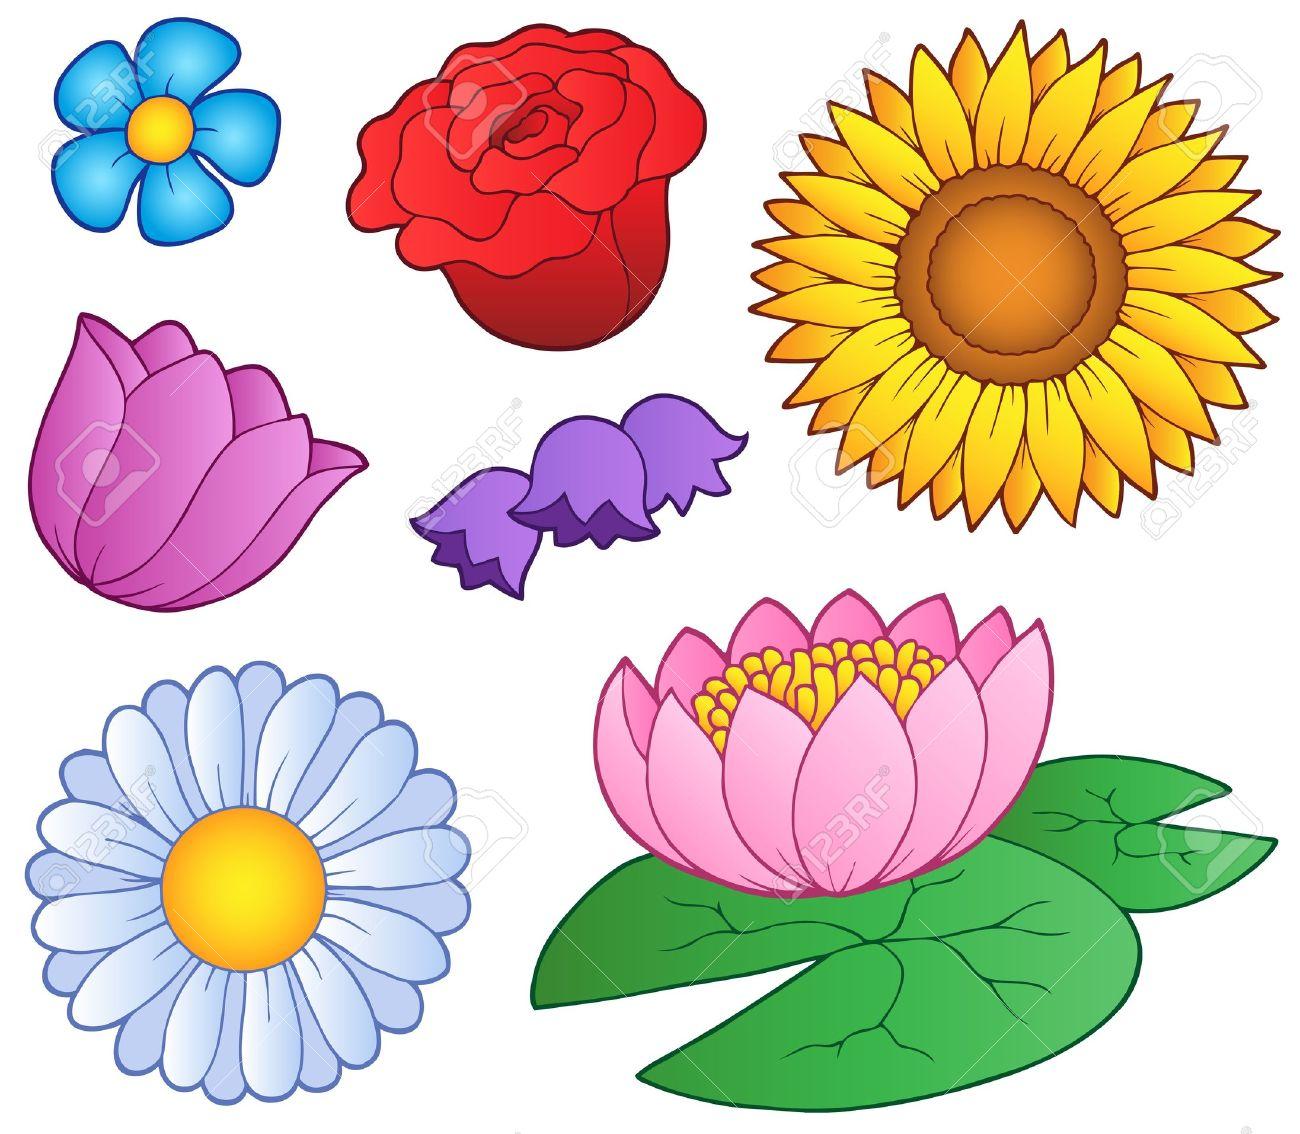 Various flowers set - vector illustration. Stock Vector - 9674318